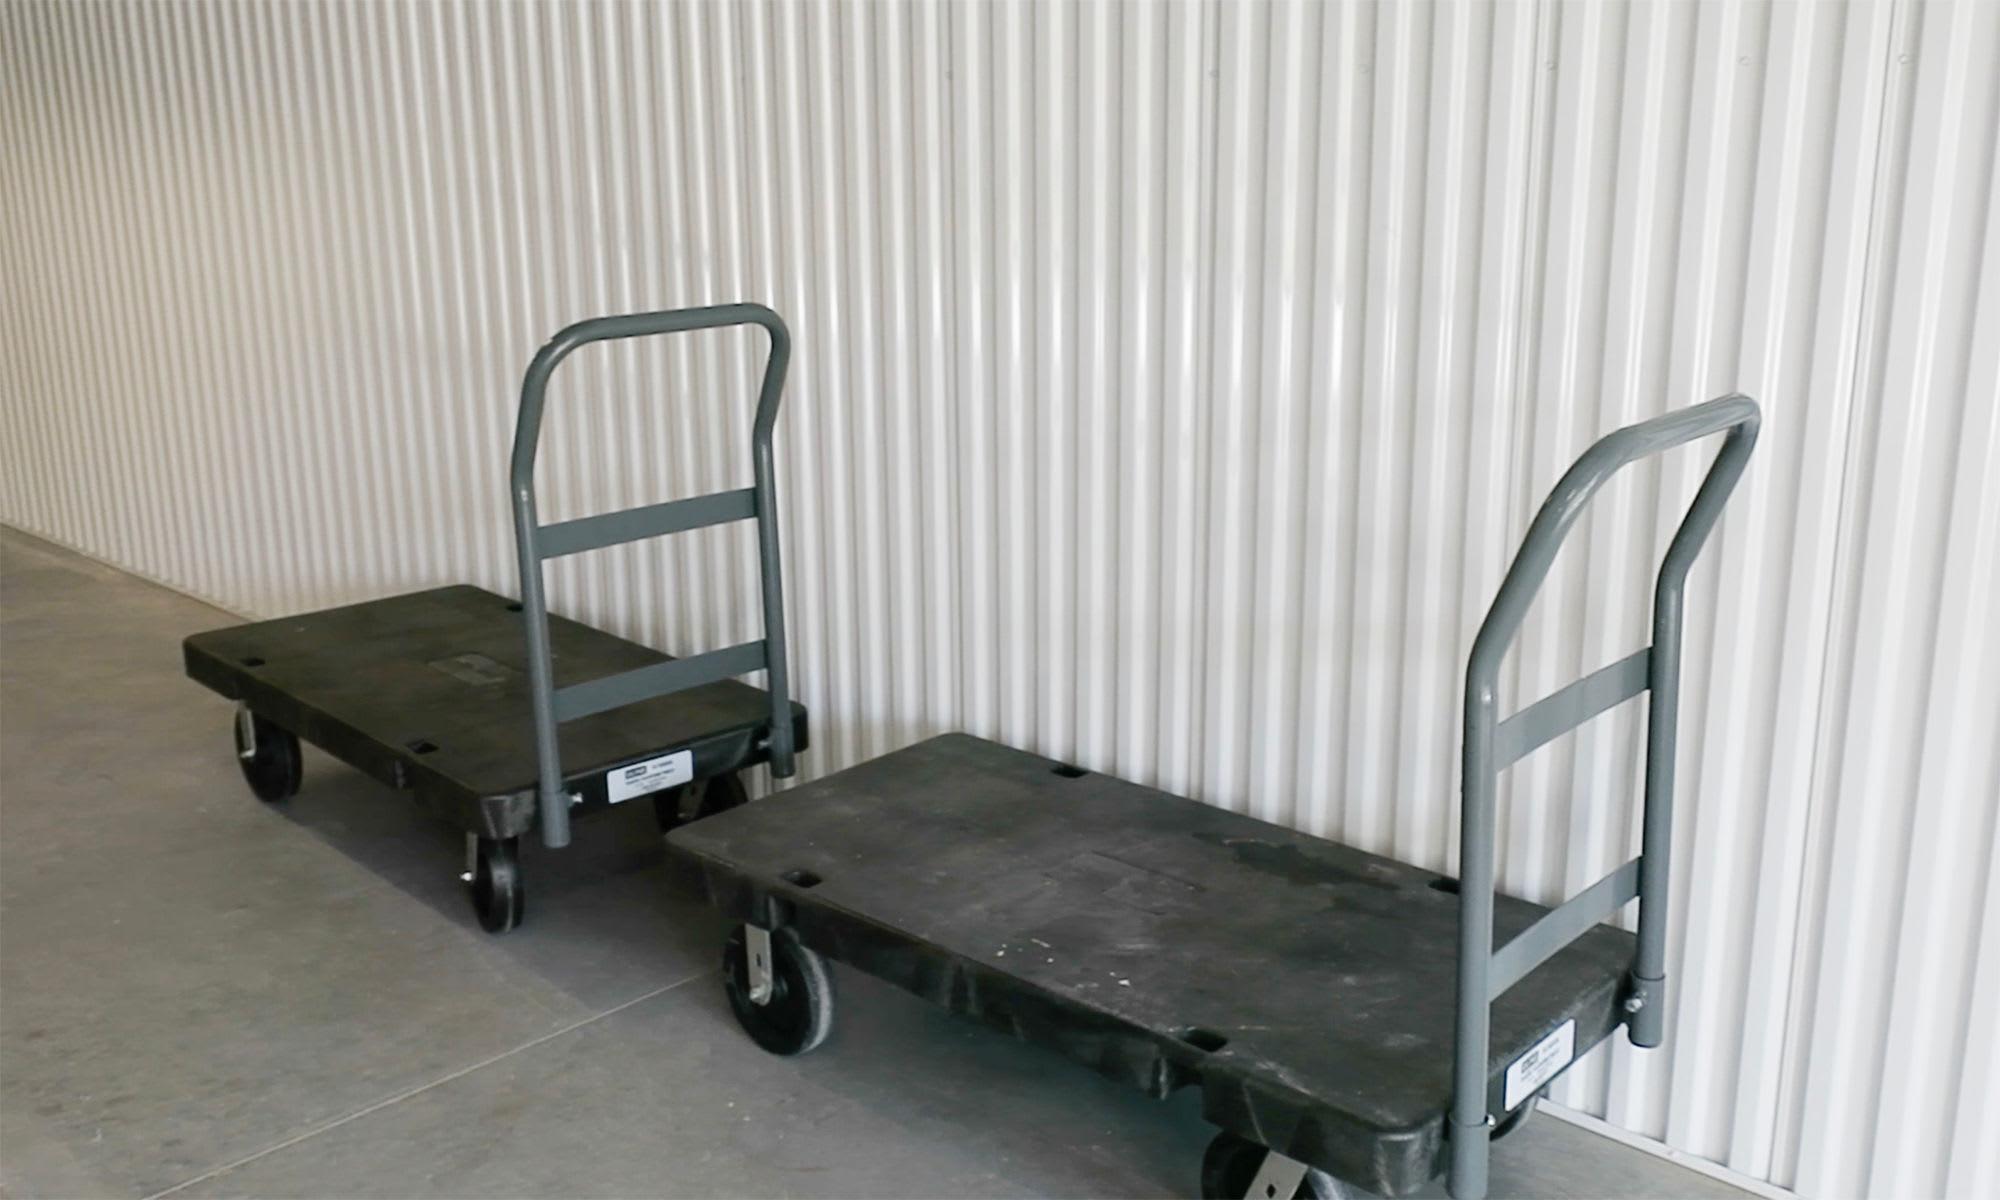 Courtesy Carts at Virginia Varsity Self Storage in Roanoke, Virginia is located